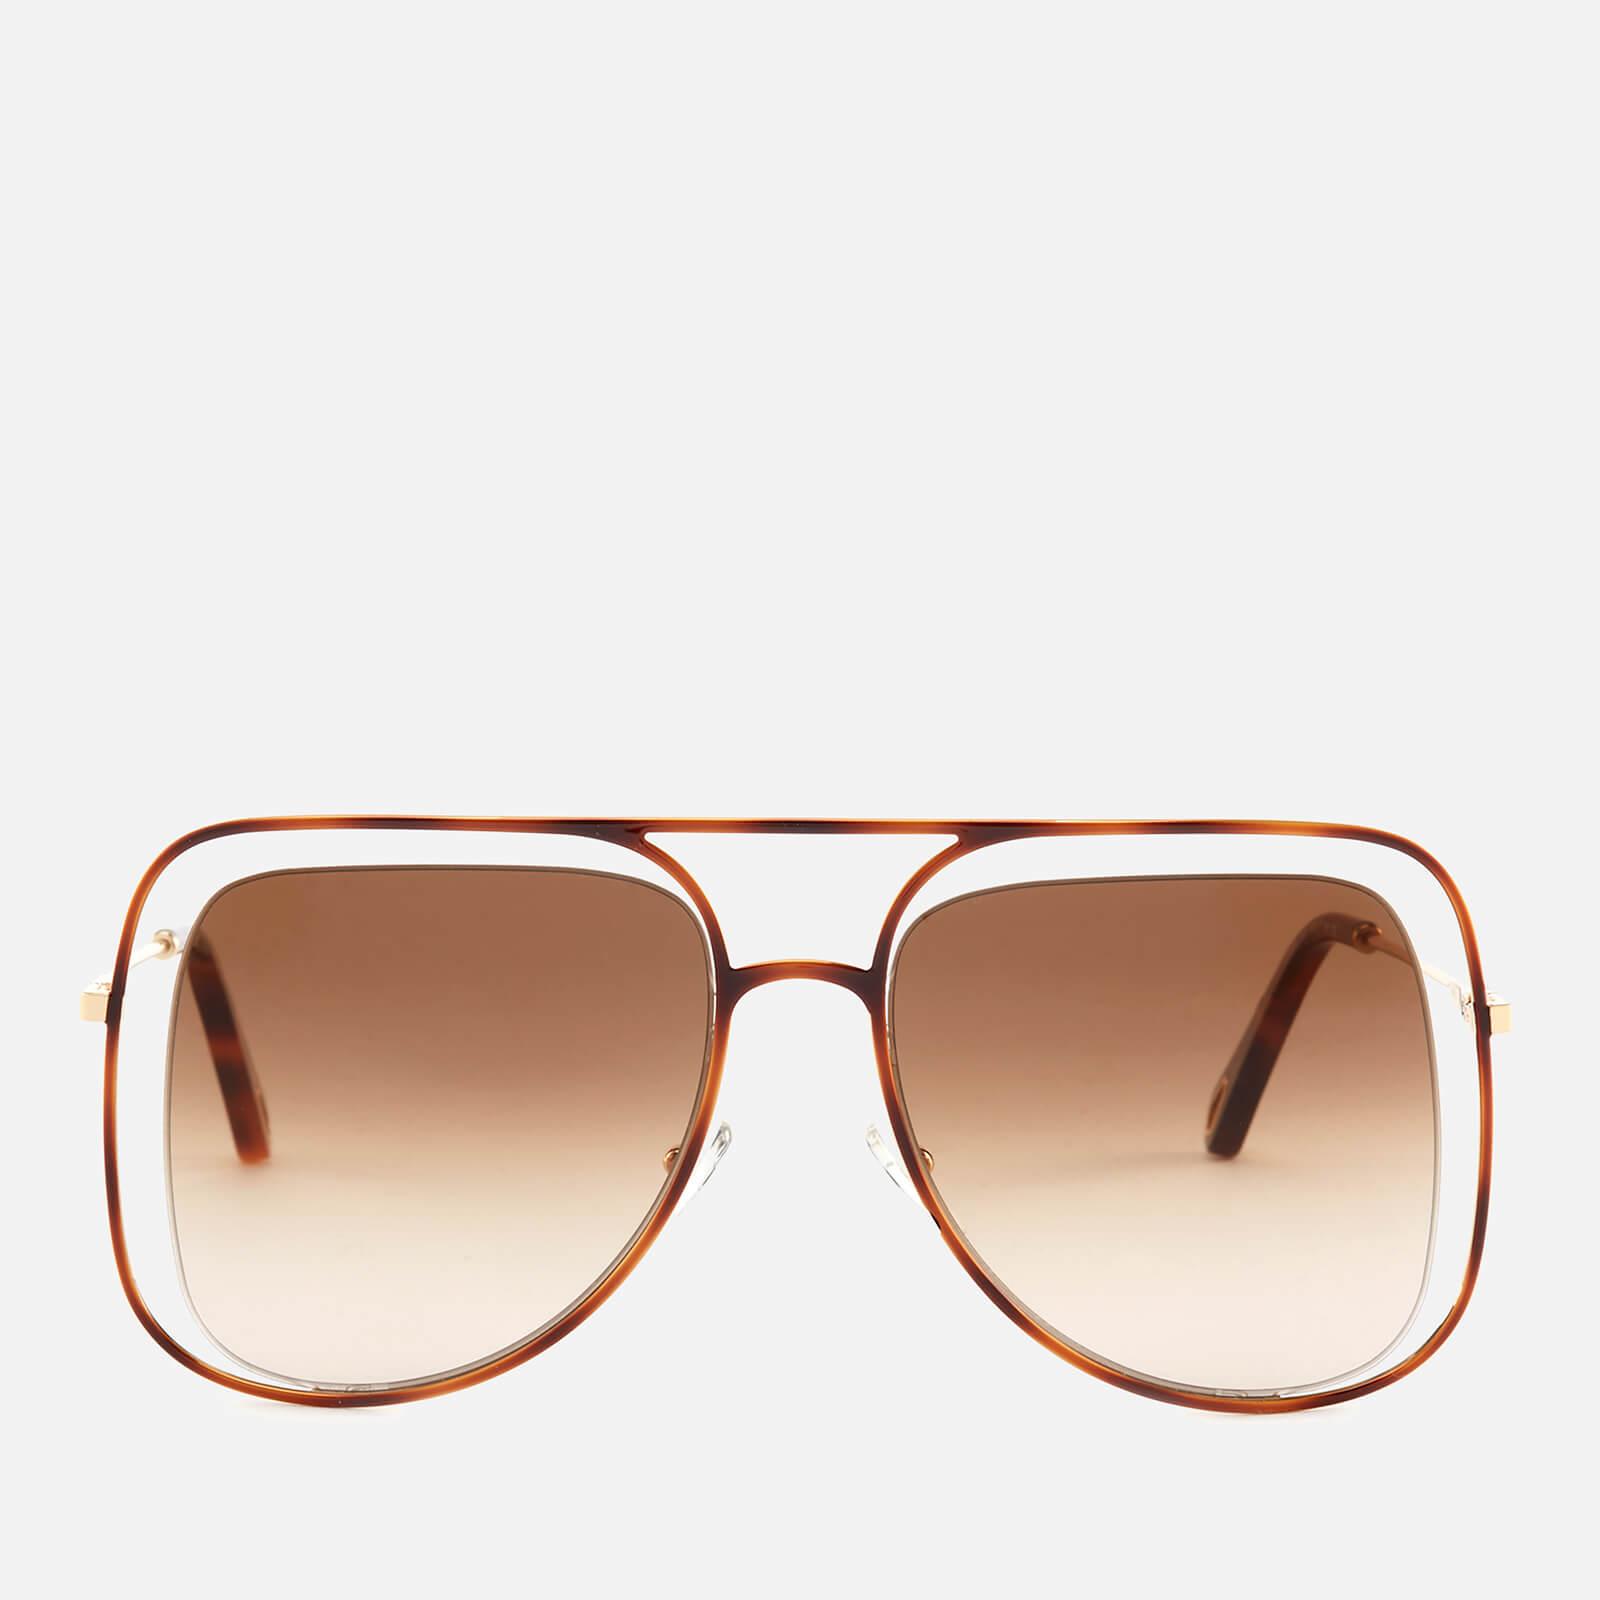 1d316cf796 Chloe Women s Poppy Aviator Sunglasses - Havanna Brown - Free UK Delivery  over £50